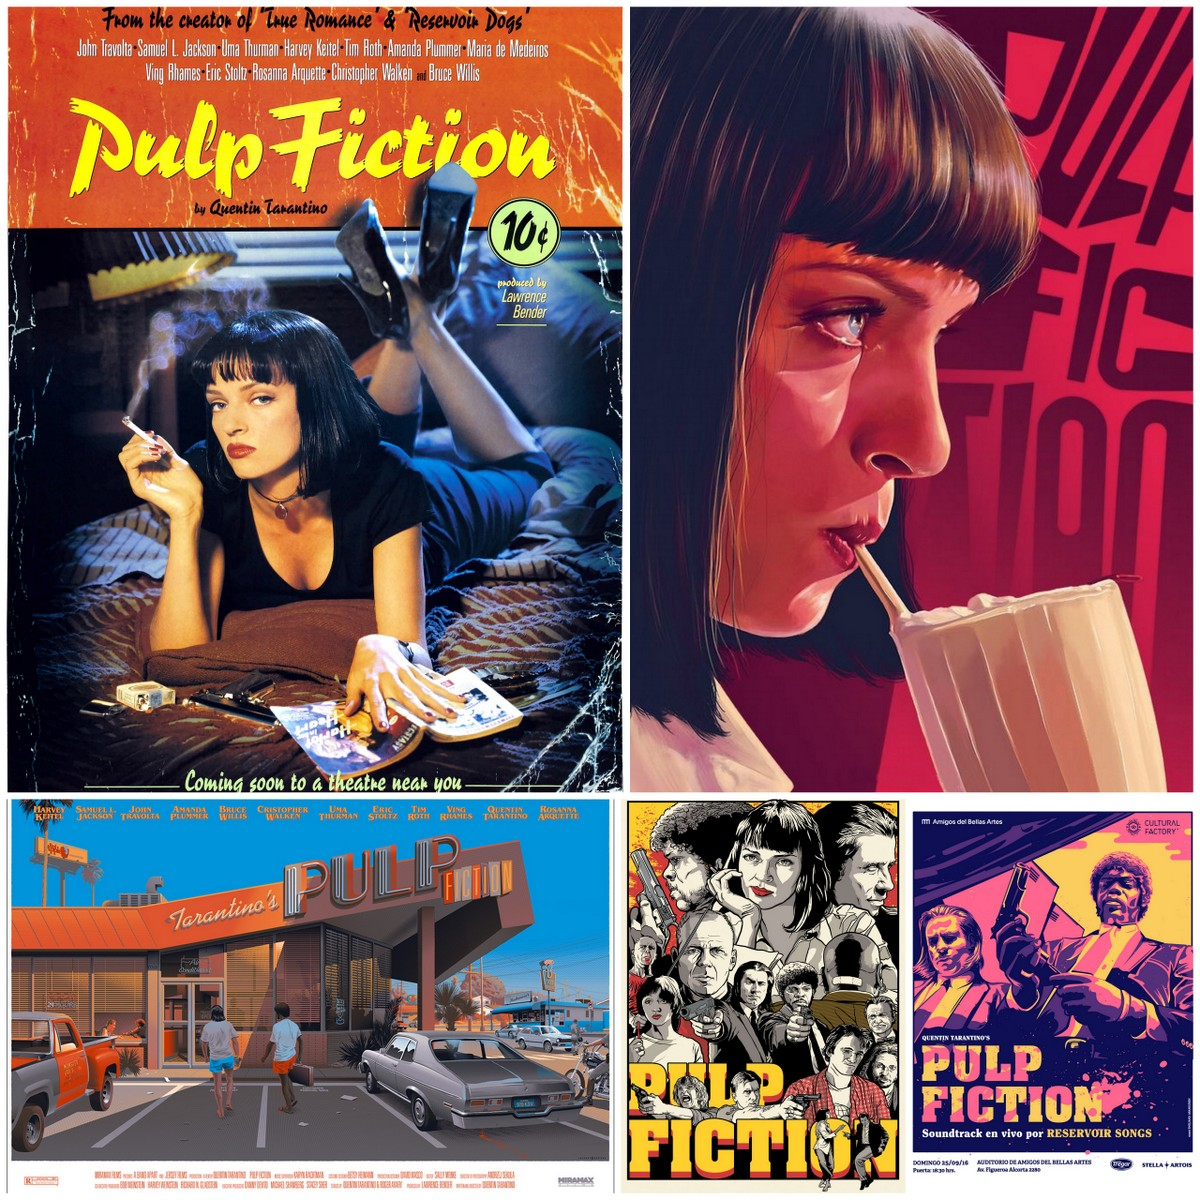 pulp-fiction-quentin-font-b-tarantino-b-font-rock-movie-poster-vintage-retro-matte-kraft-paper-retro-poster-wall-sticker-home-decora